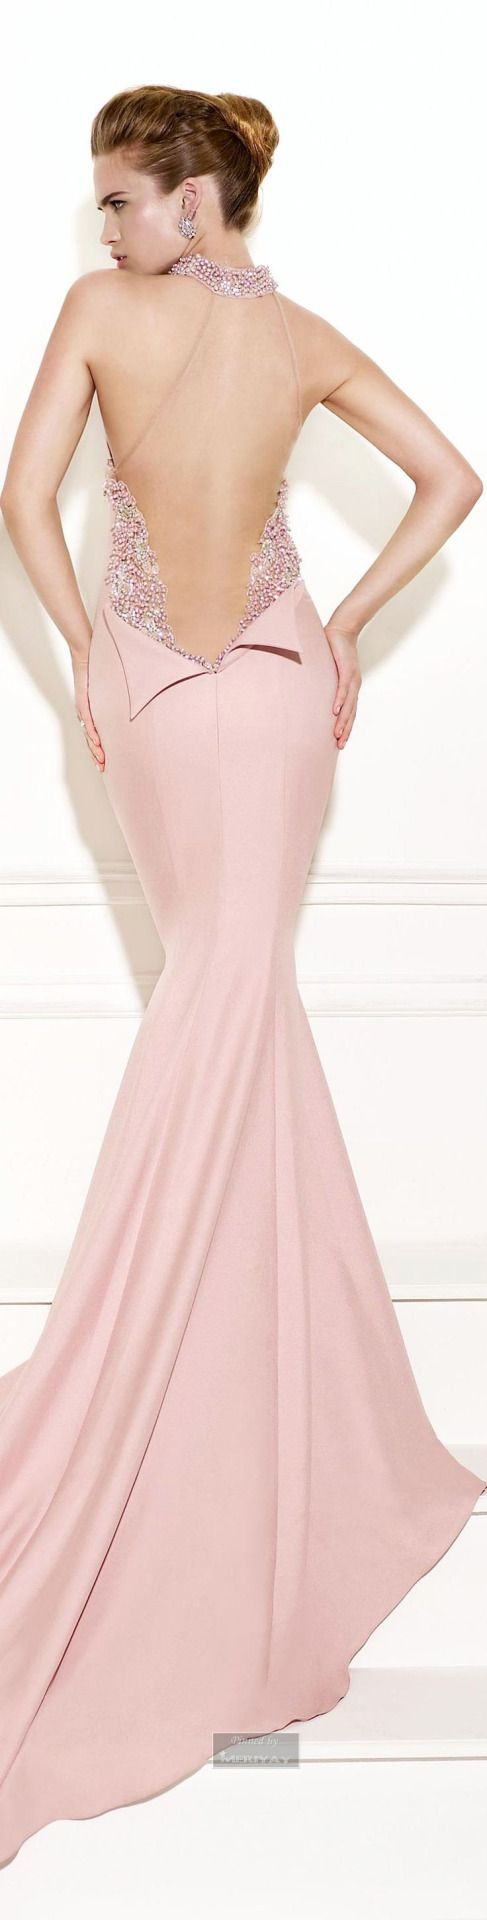 39 best mexican 2 images on Pinterest | Low cut dresses, Classy ...